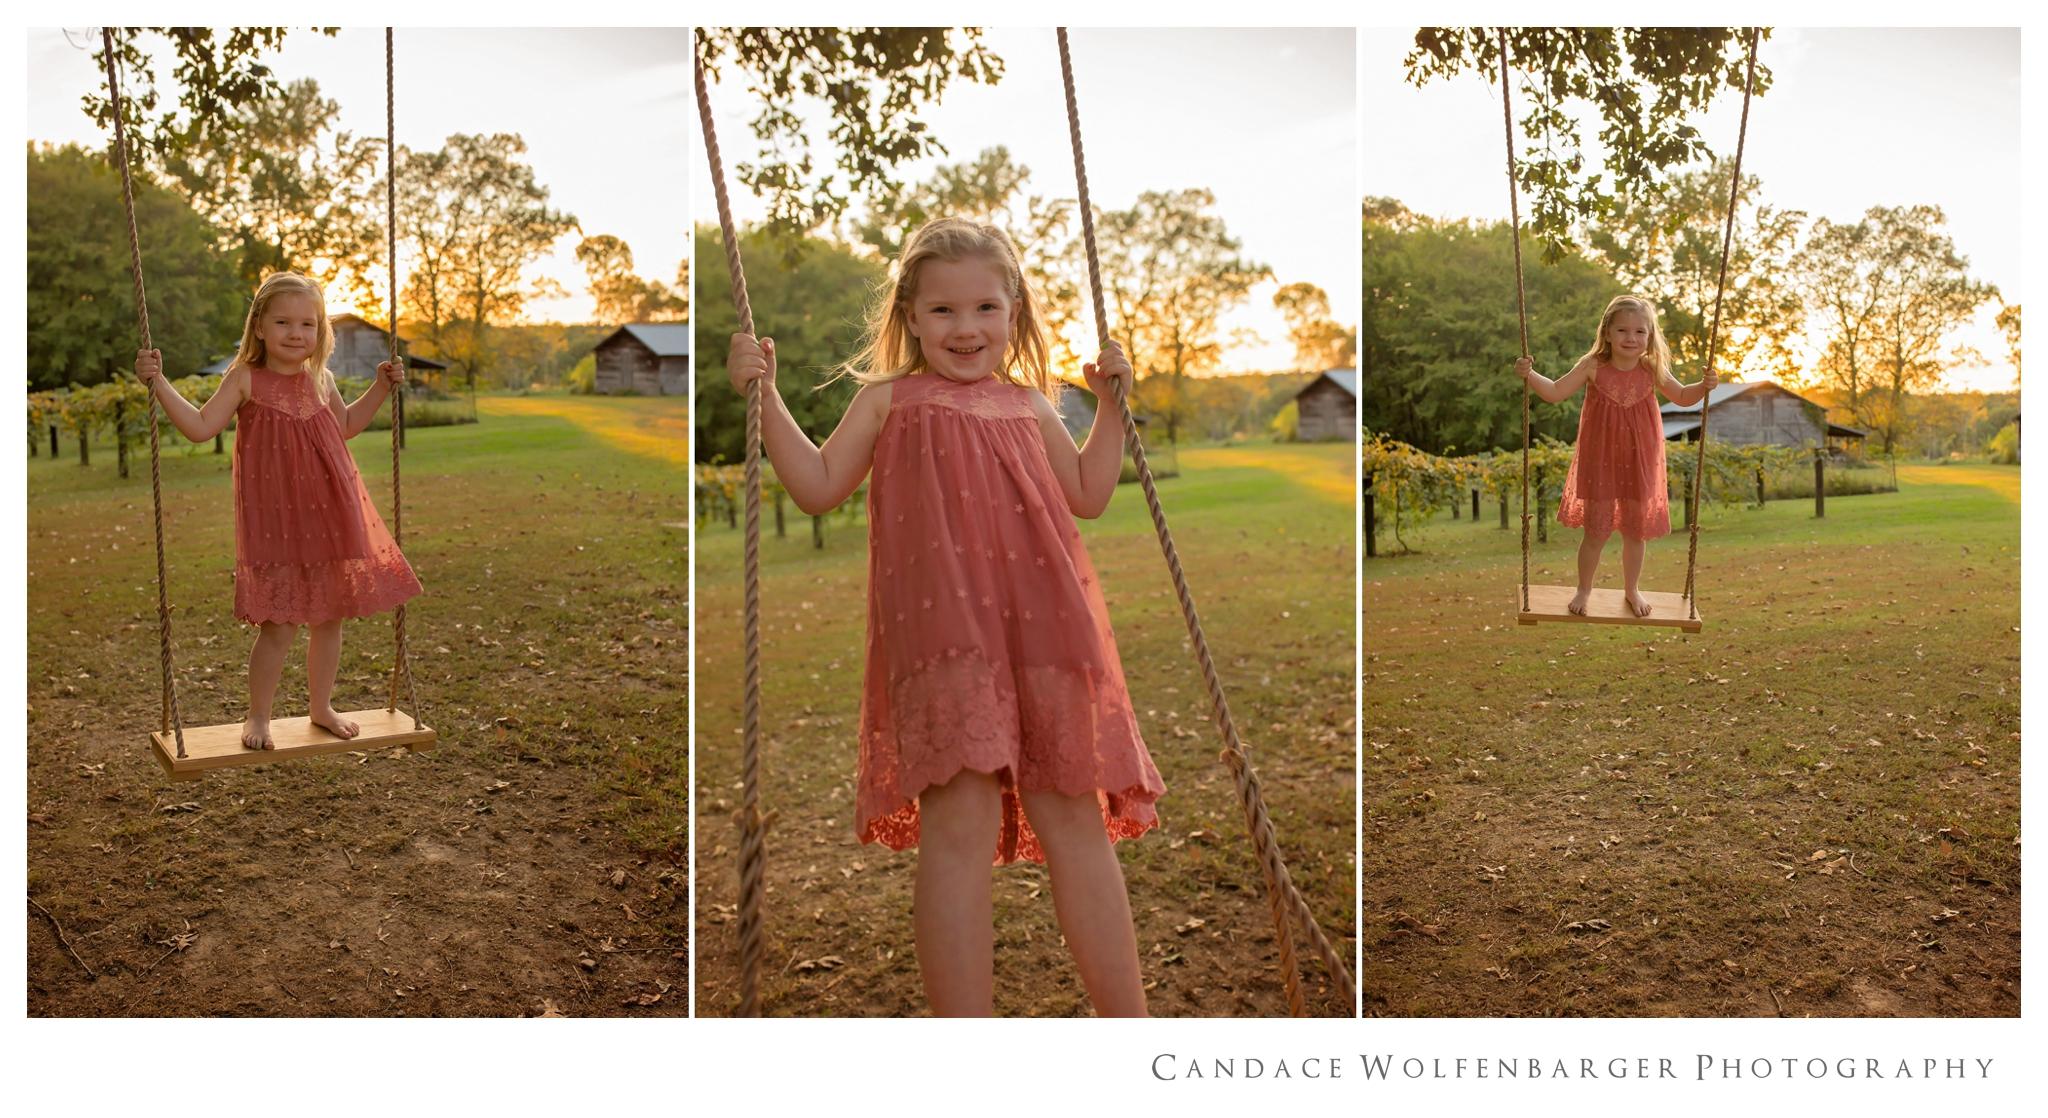 Naaman Caroline Swing Session Candace Wolfenbarger Sanford NC Childrens Photographer 9.jpg